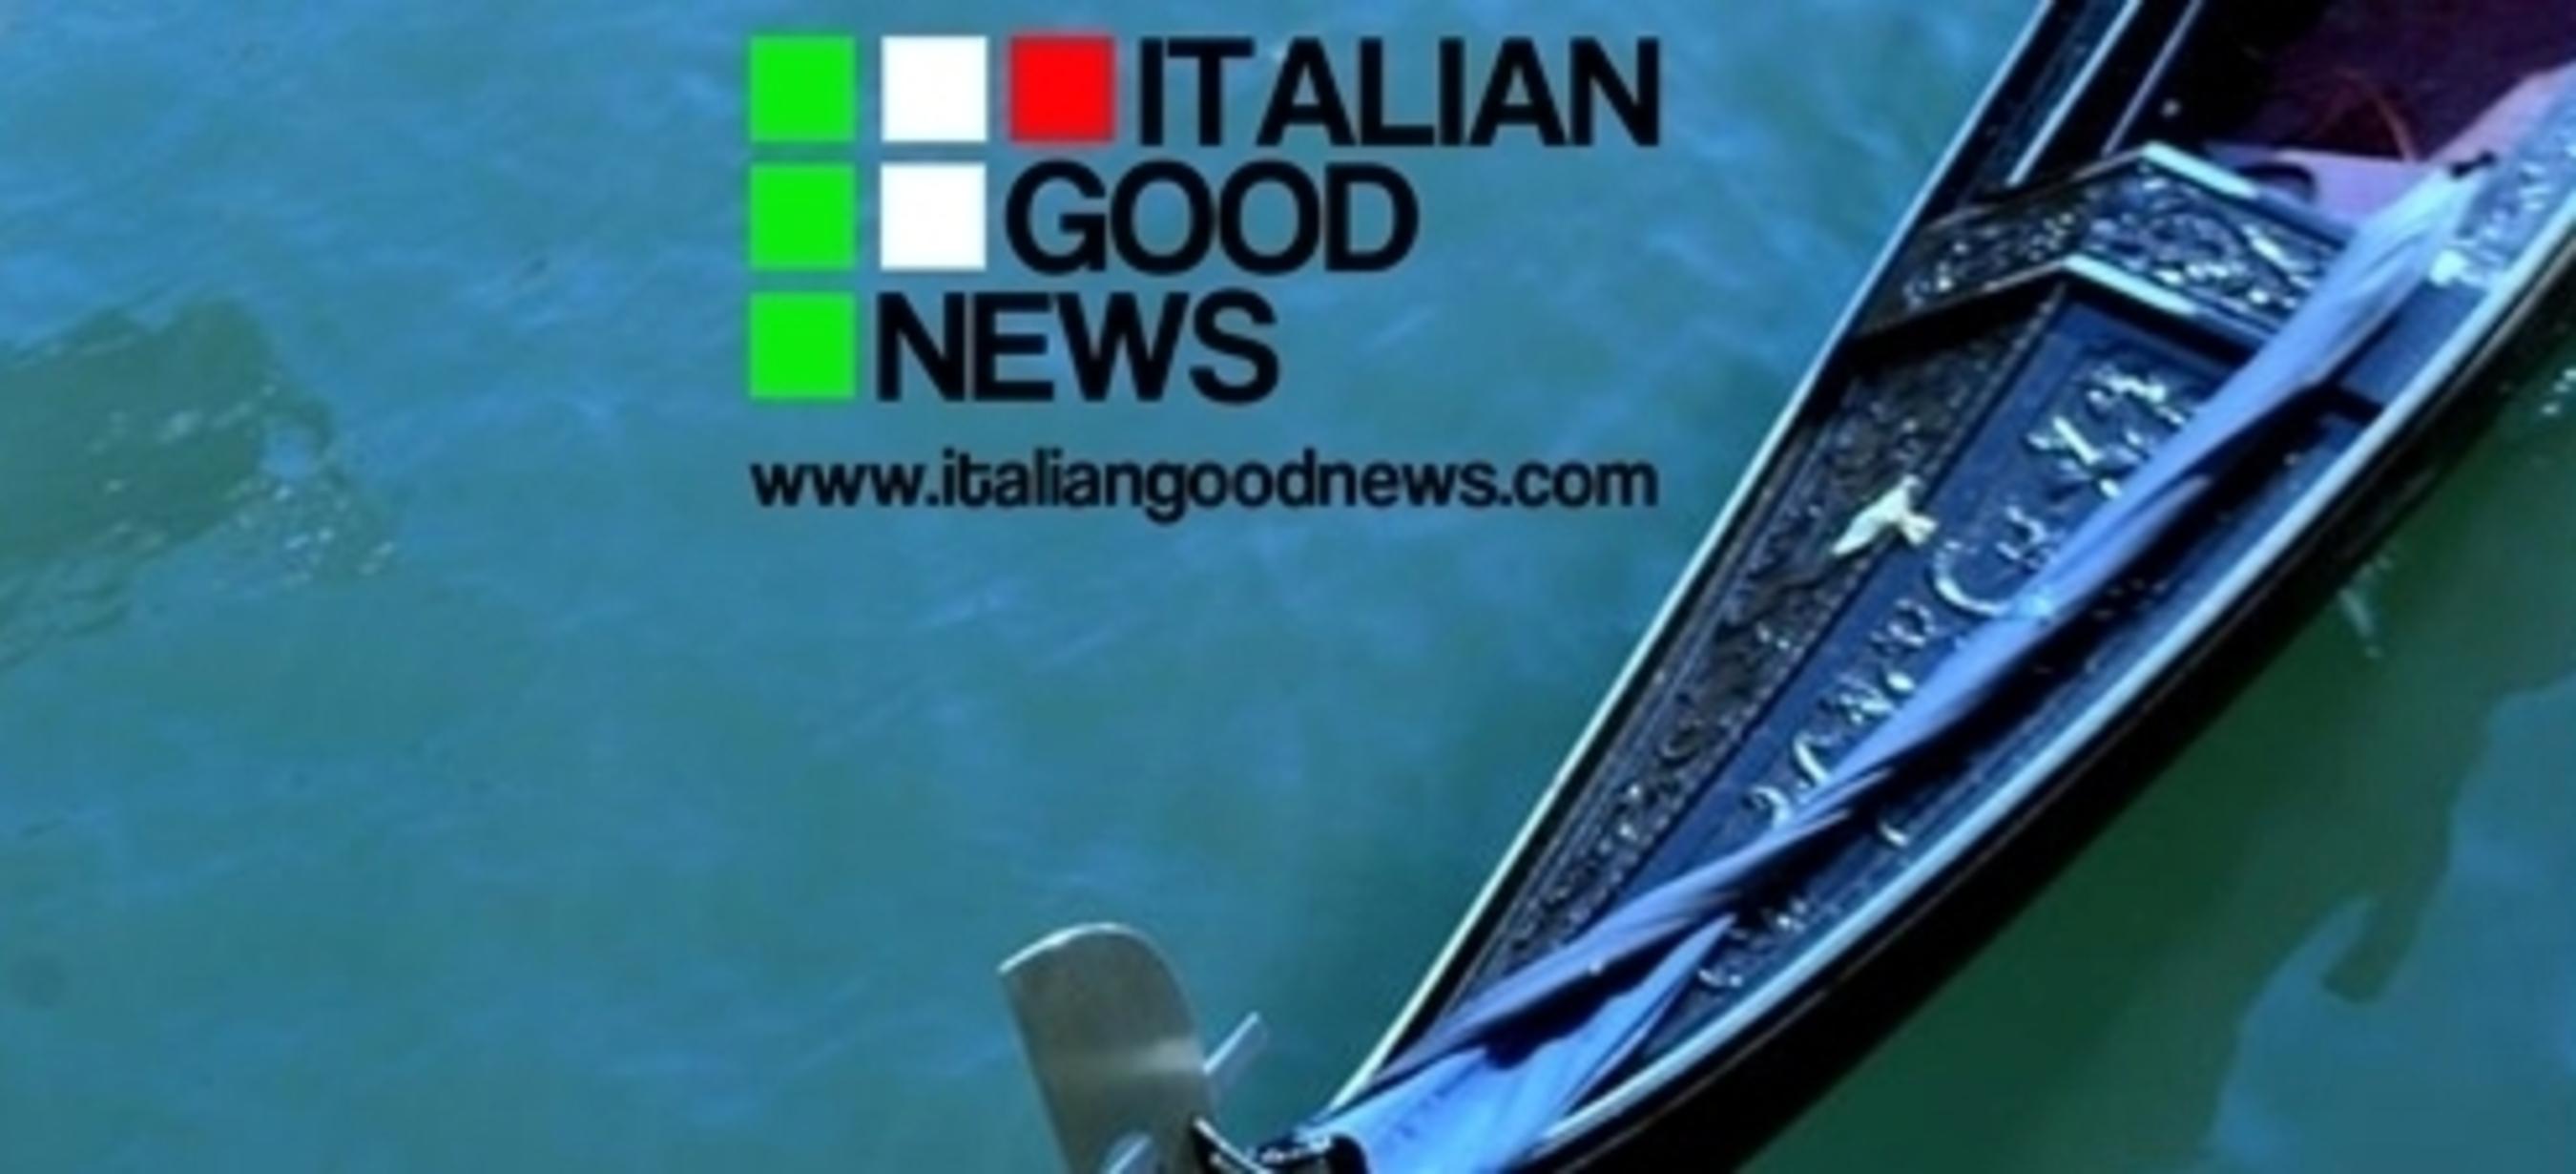 Italian Good News: the Voice of the Italian Success Abroad